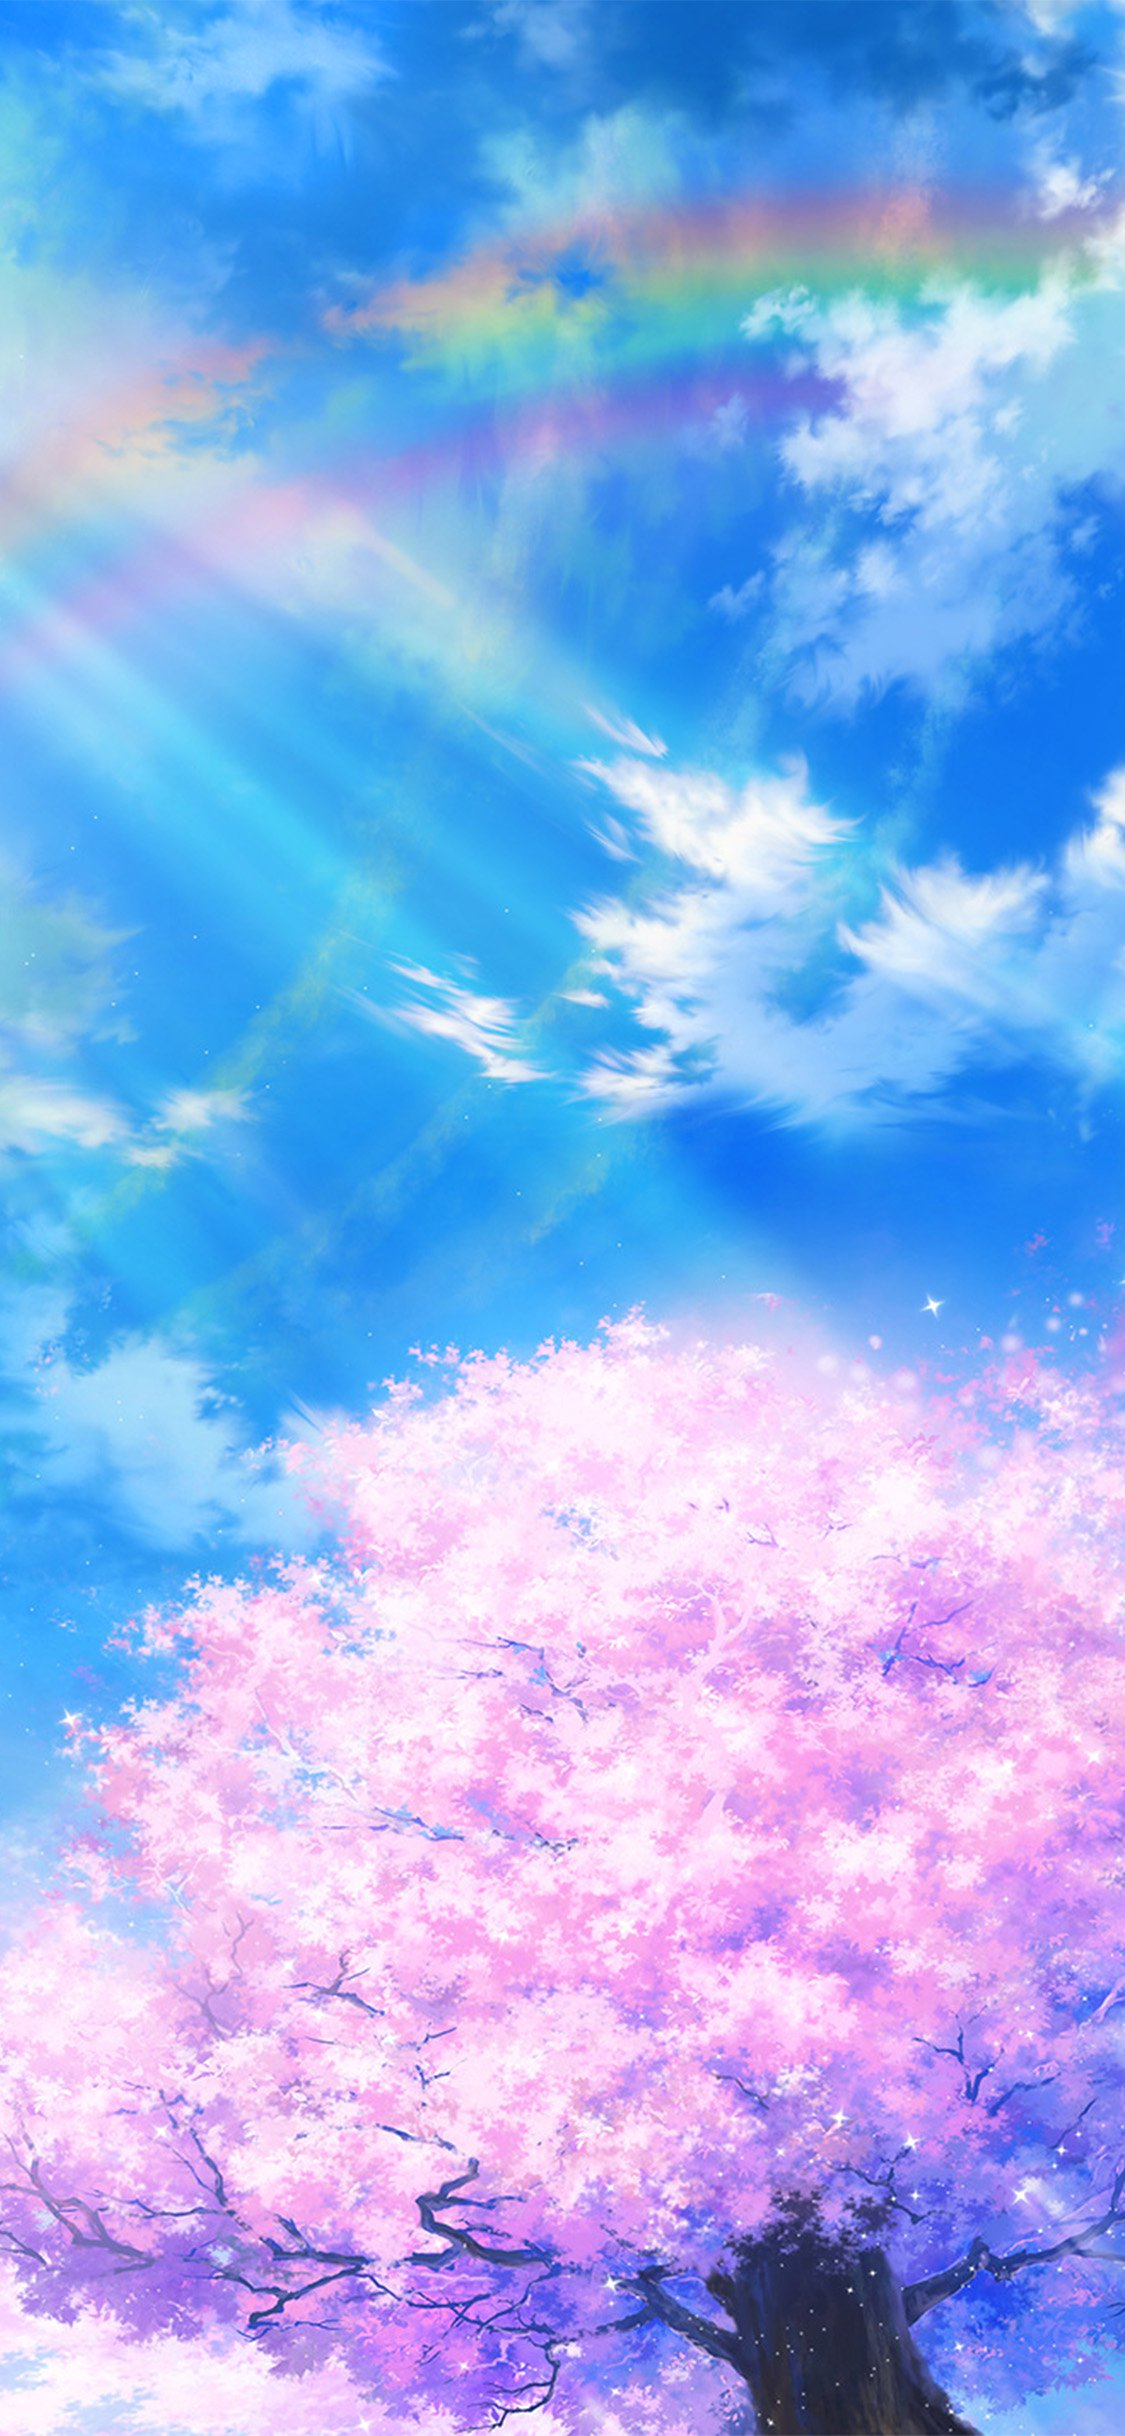 Anime sky cloud spring art illustration iPhone X wallpaper